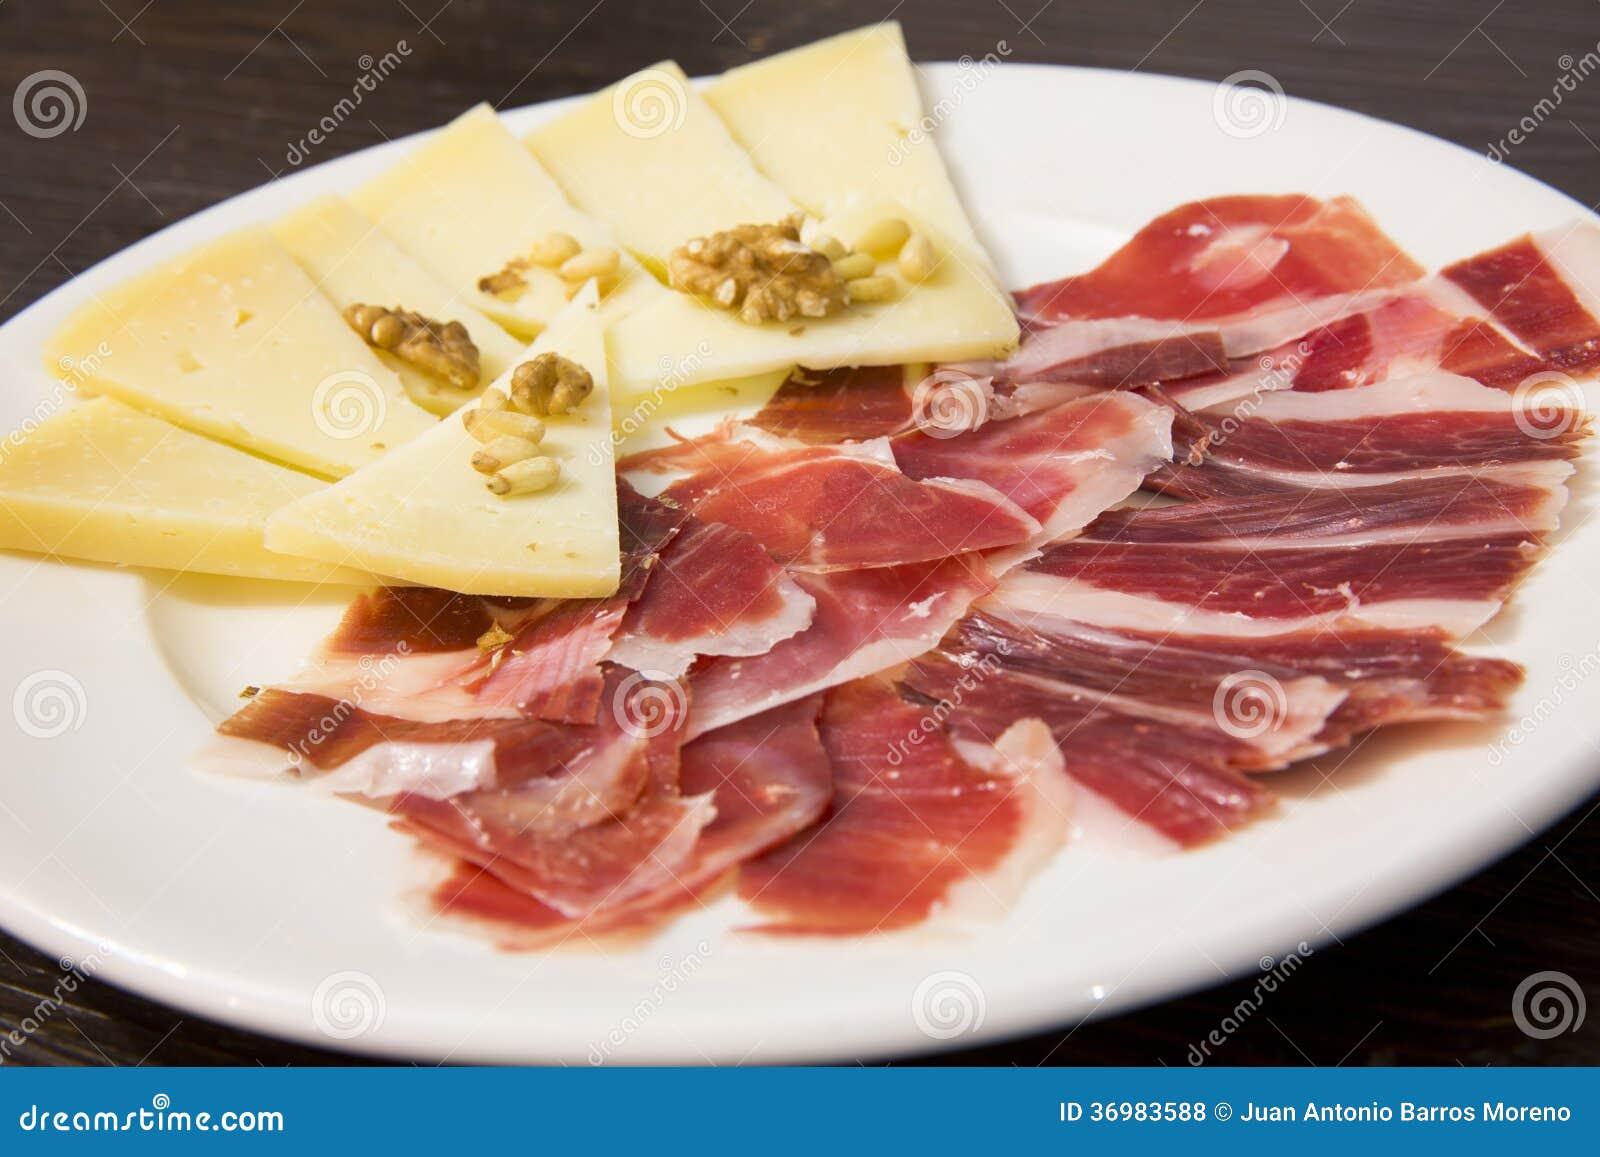 Plat De Nourriture Nourriture Espagnole Photo Stock